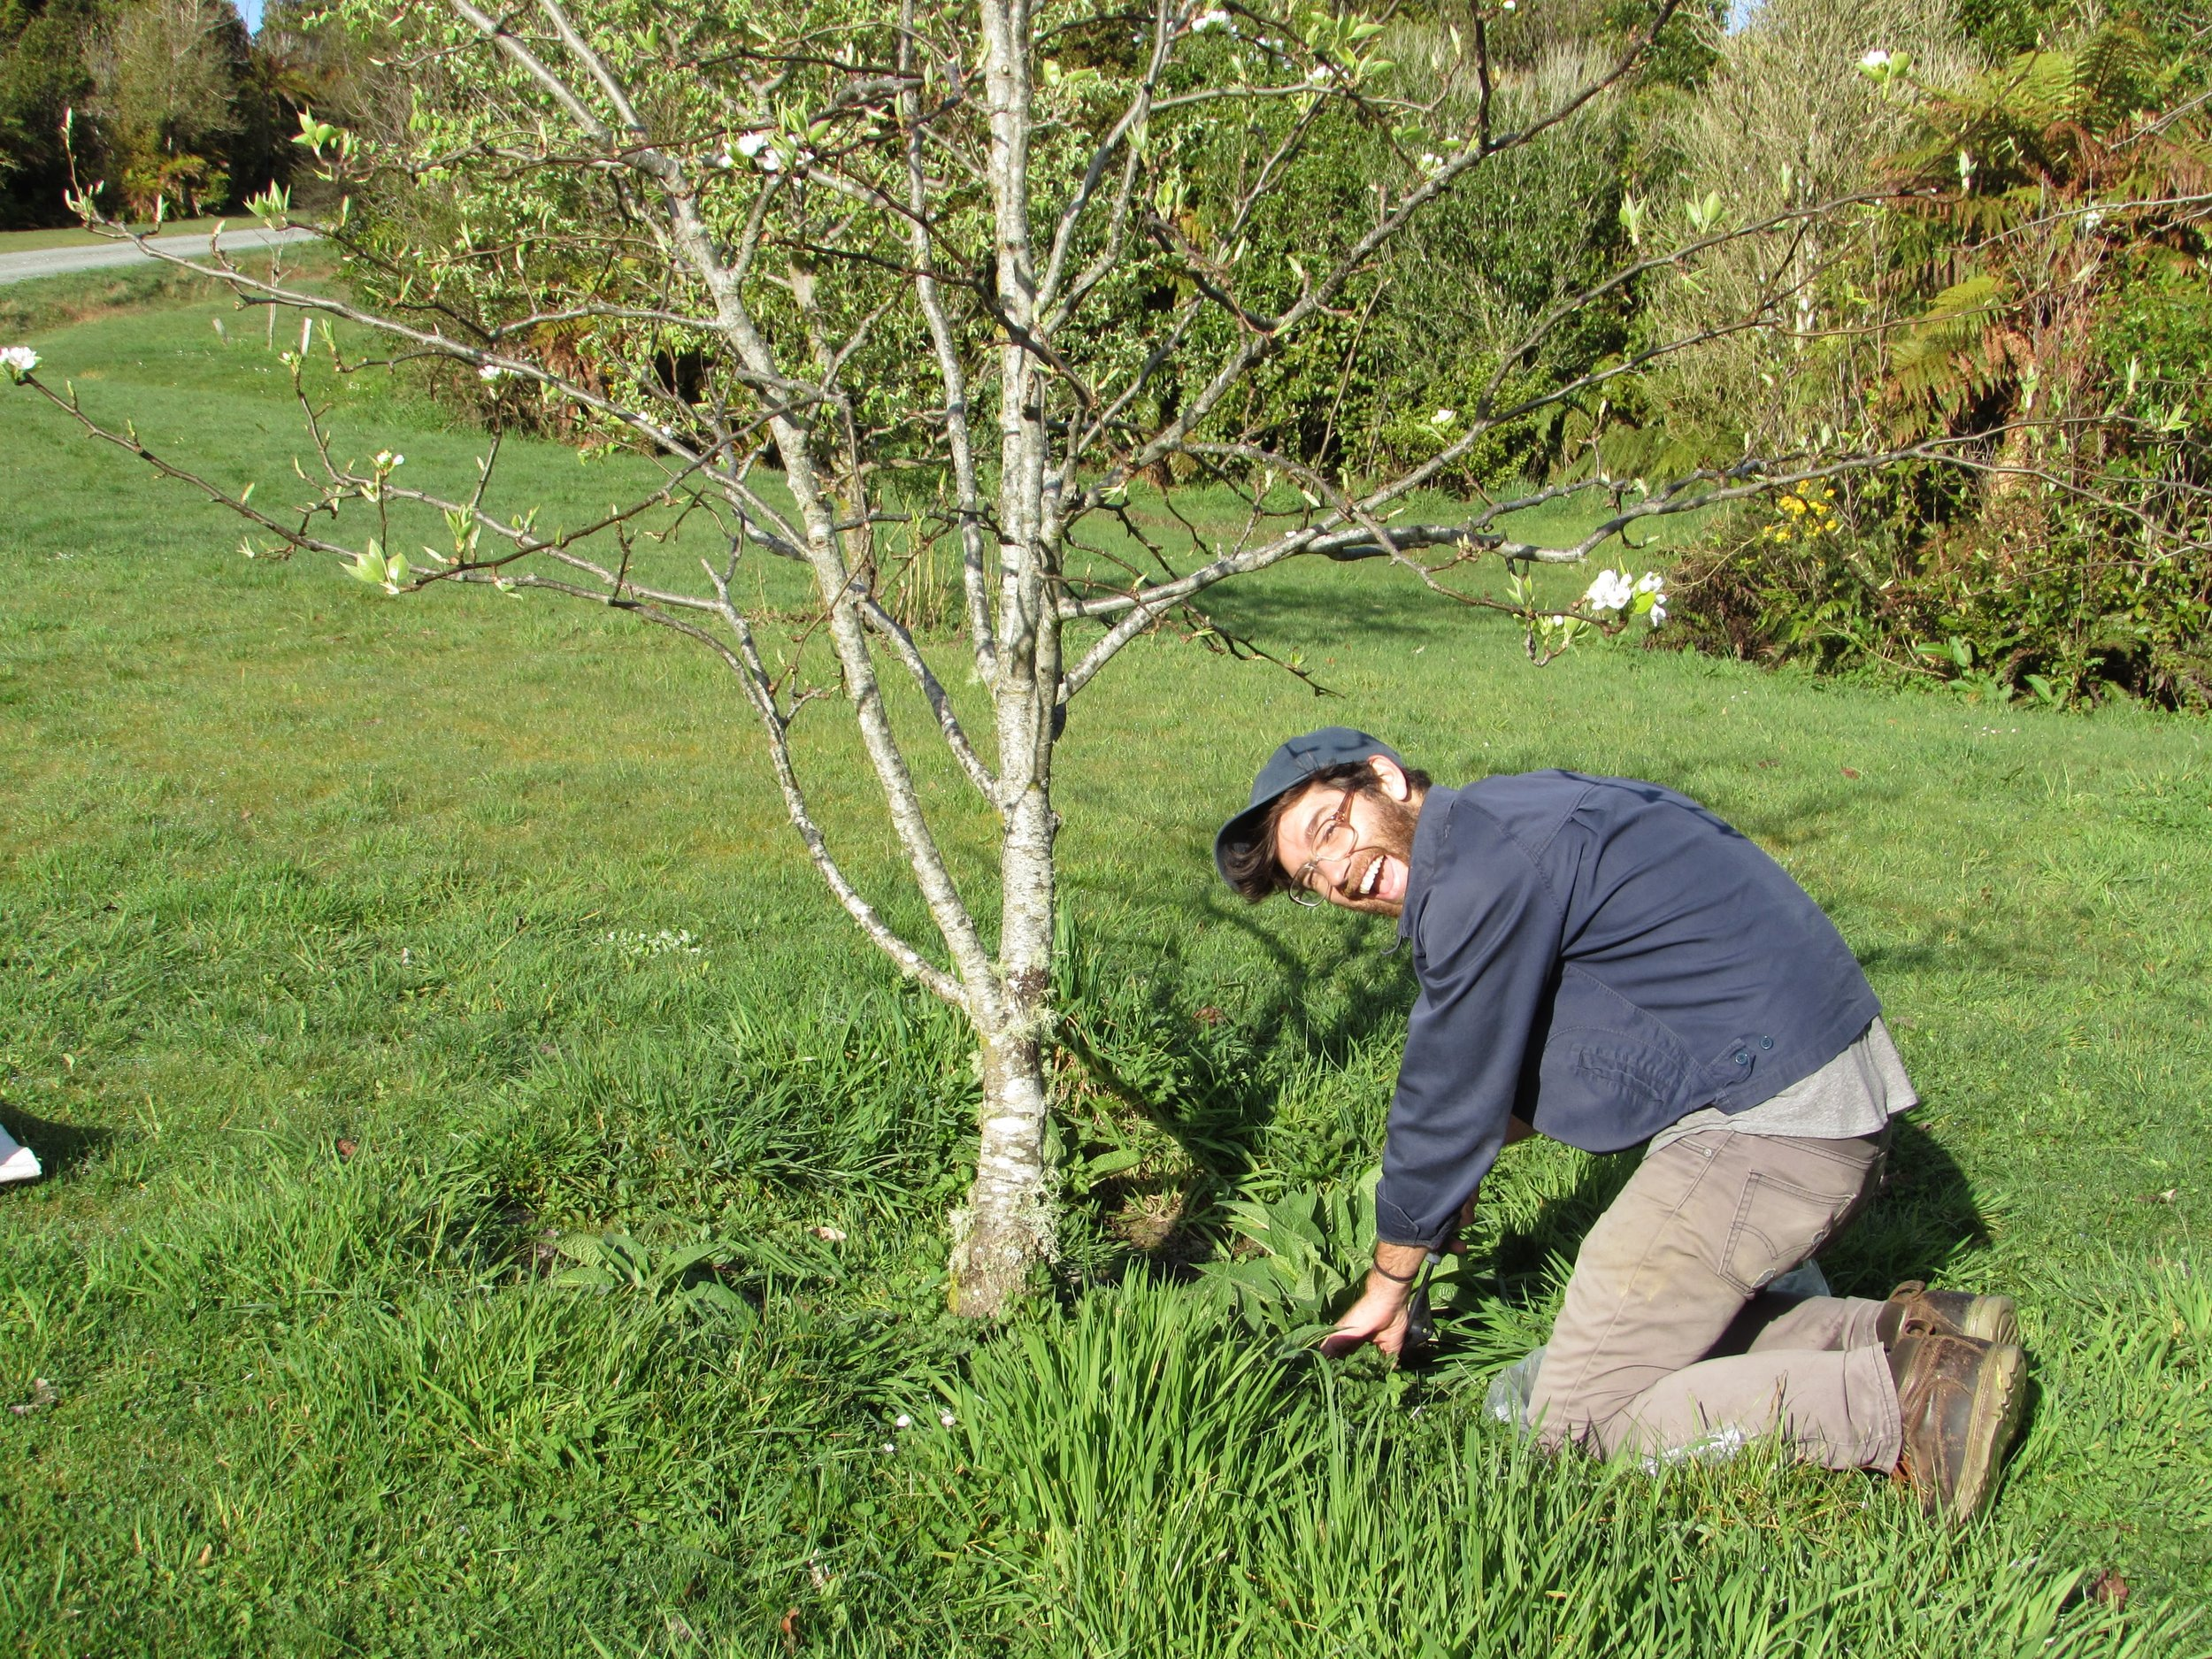 Emmett weeding around the drip-line in our West Coast host's mini-orchard.